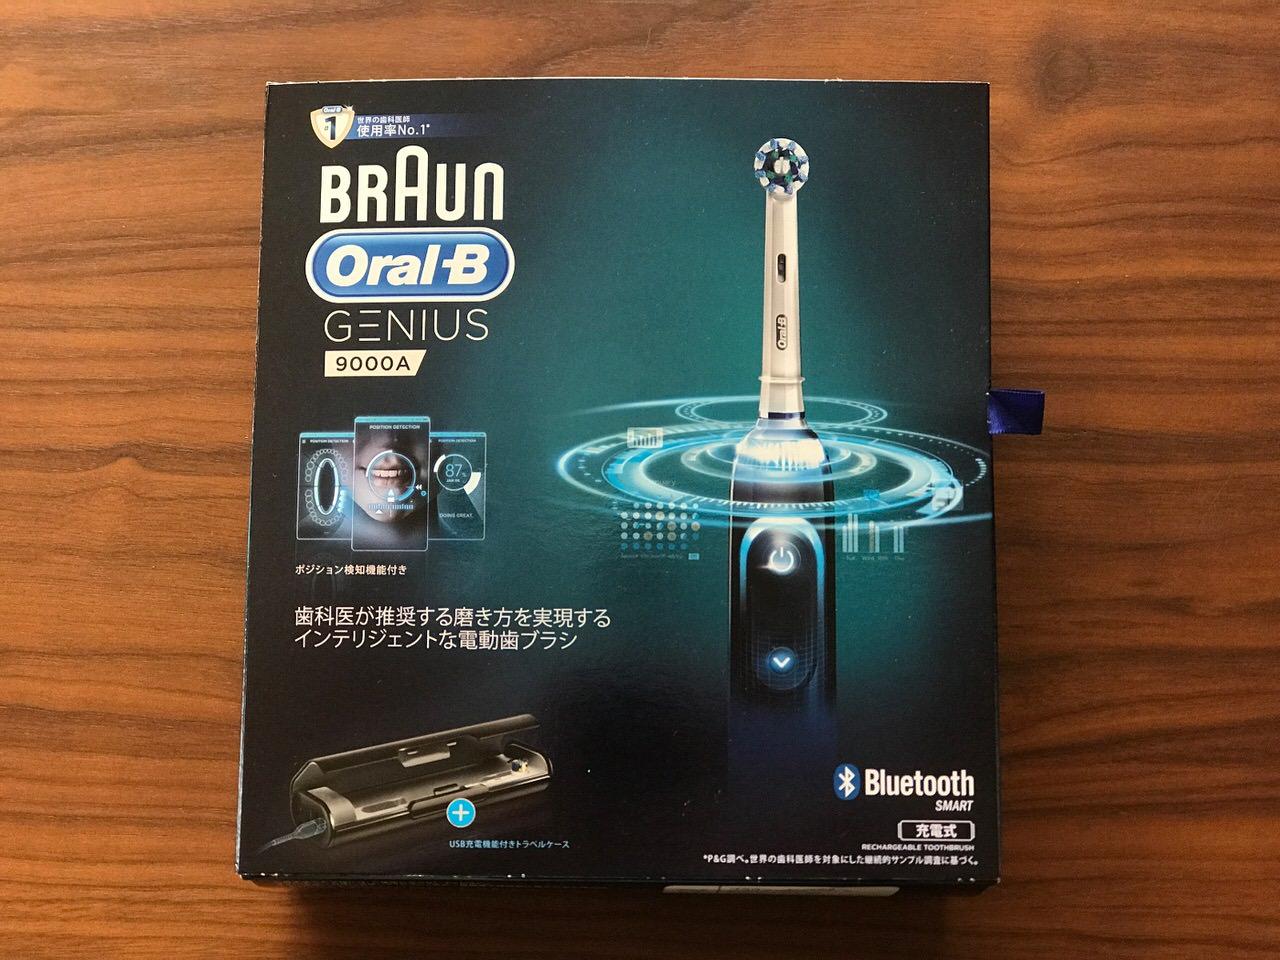 Braun oral b genius 9000a 0129